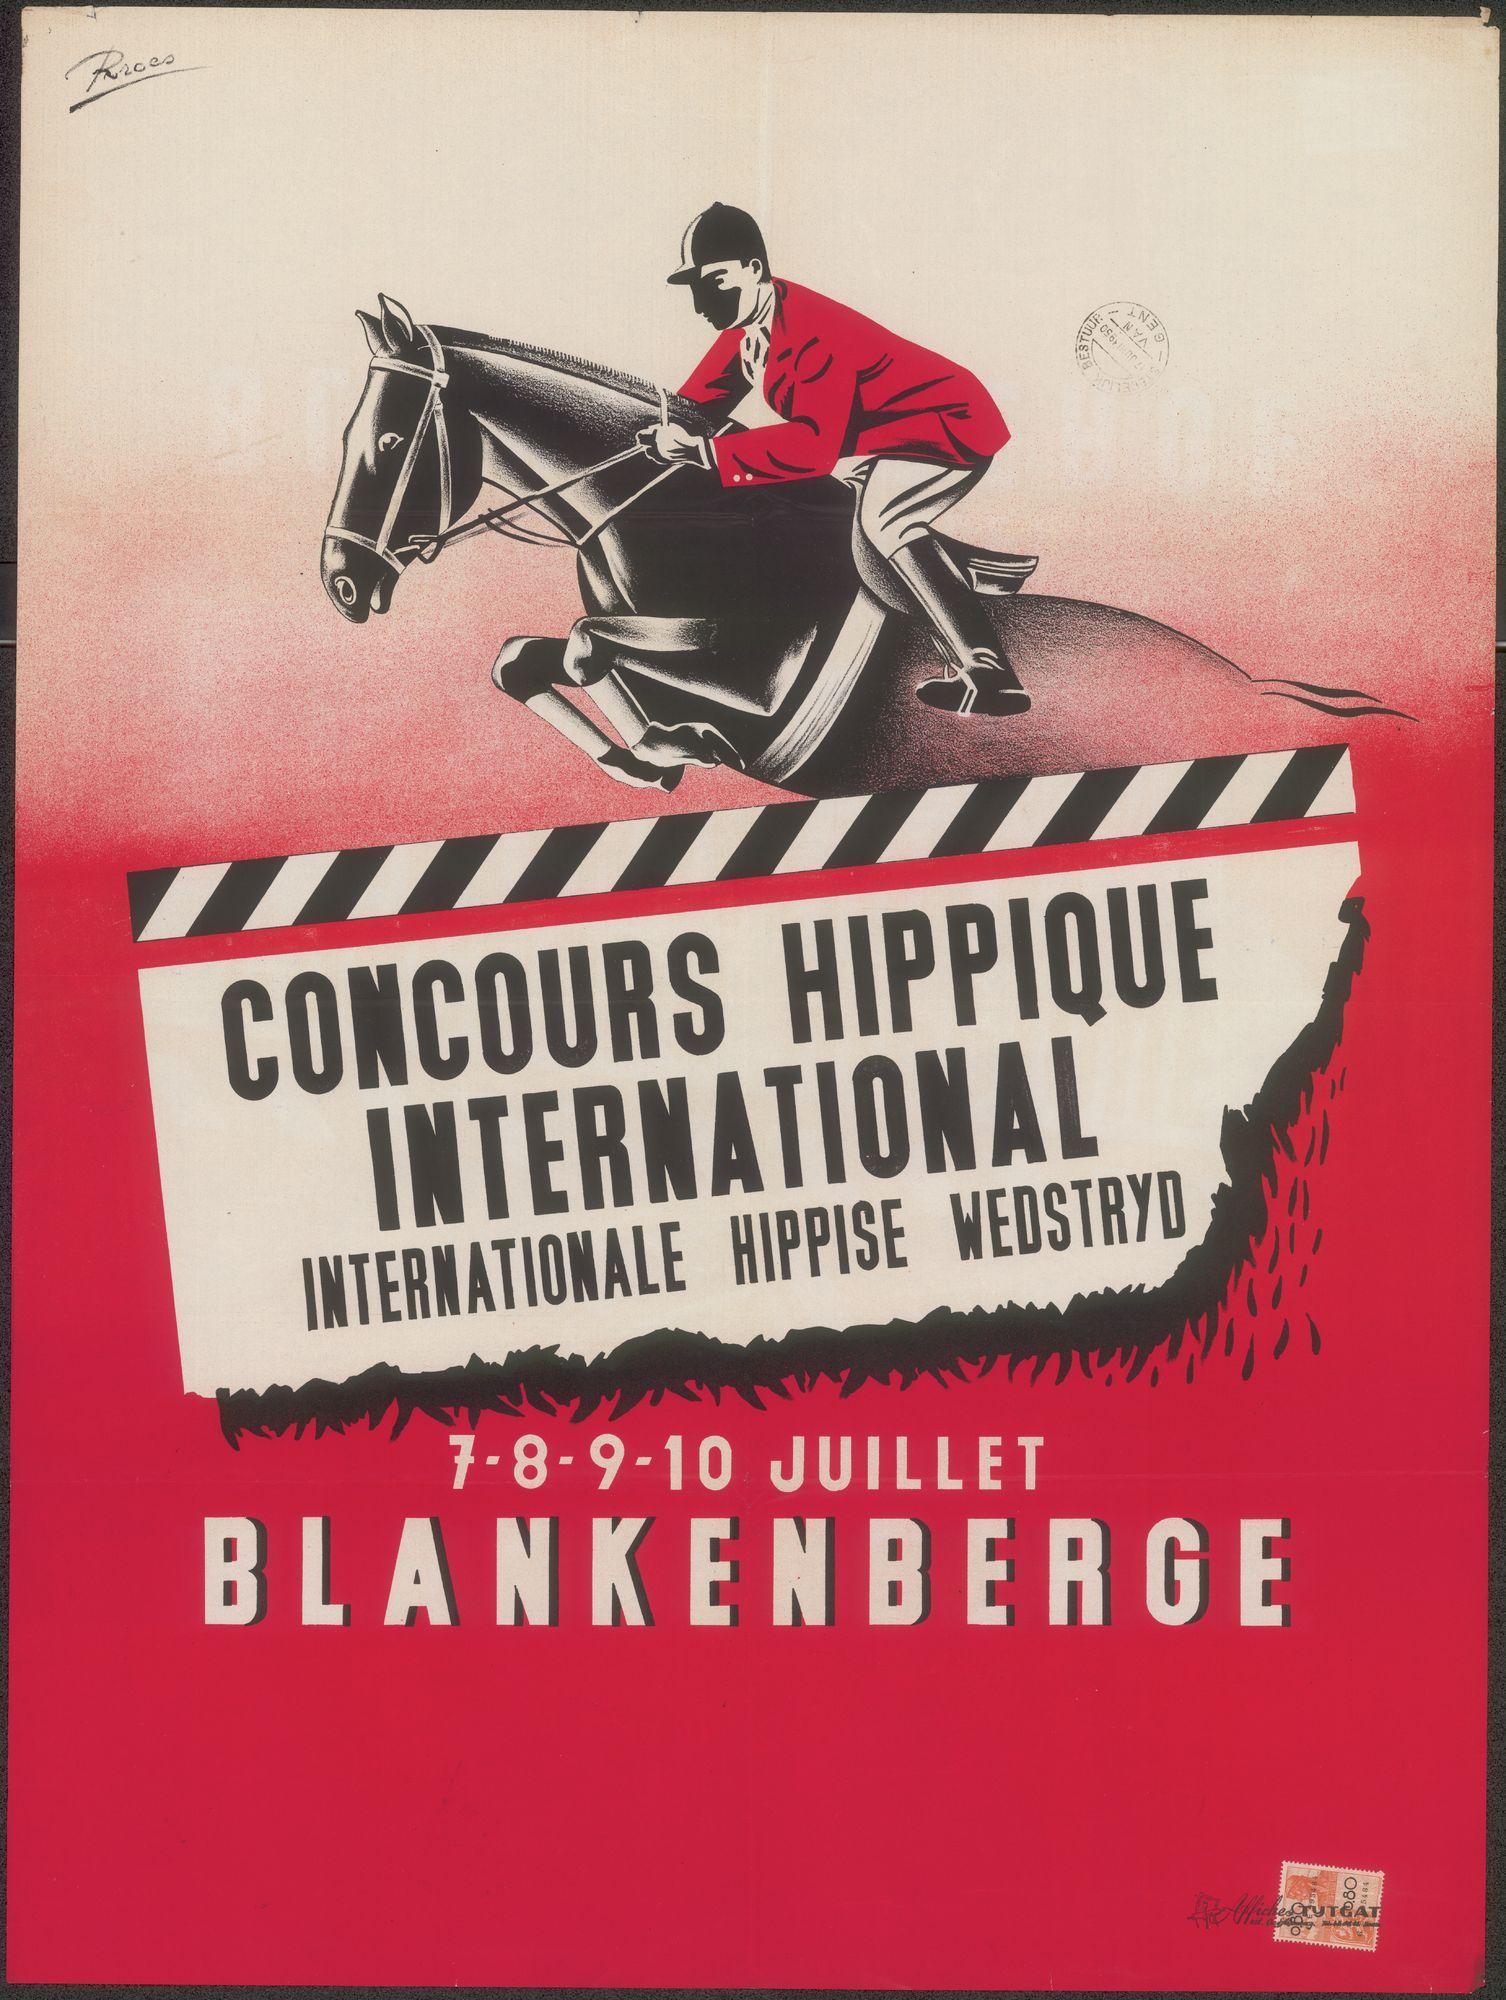 Concours Hippique International | Internationale Hippise Wedstrijd, Blankenberge, 7 - 8 - 9 - 10 juillet 1950